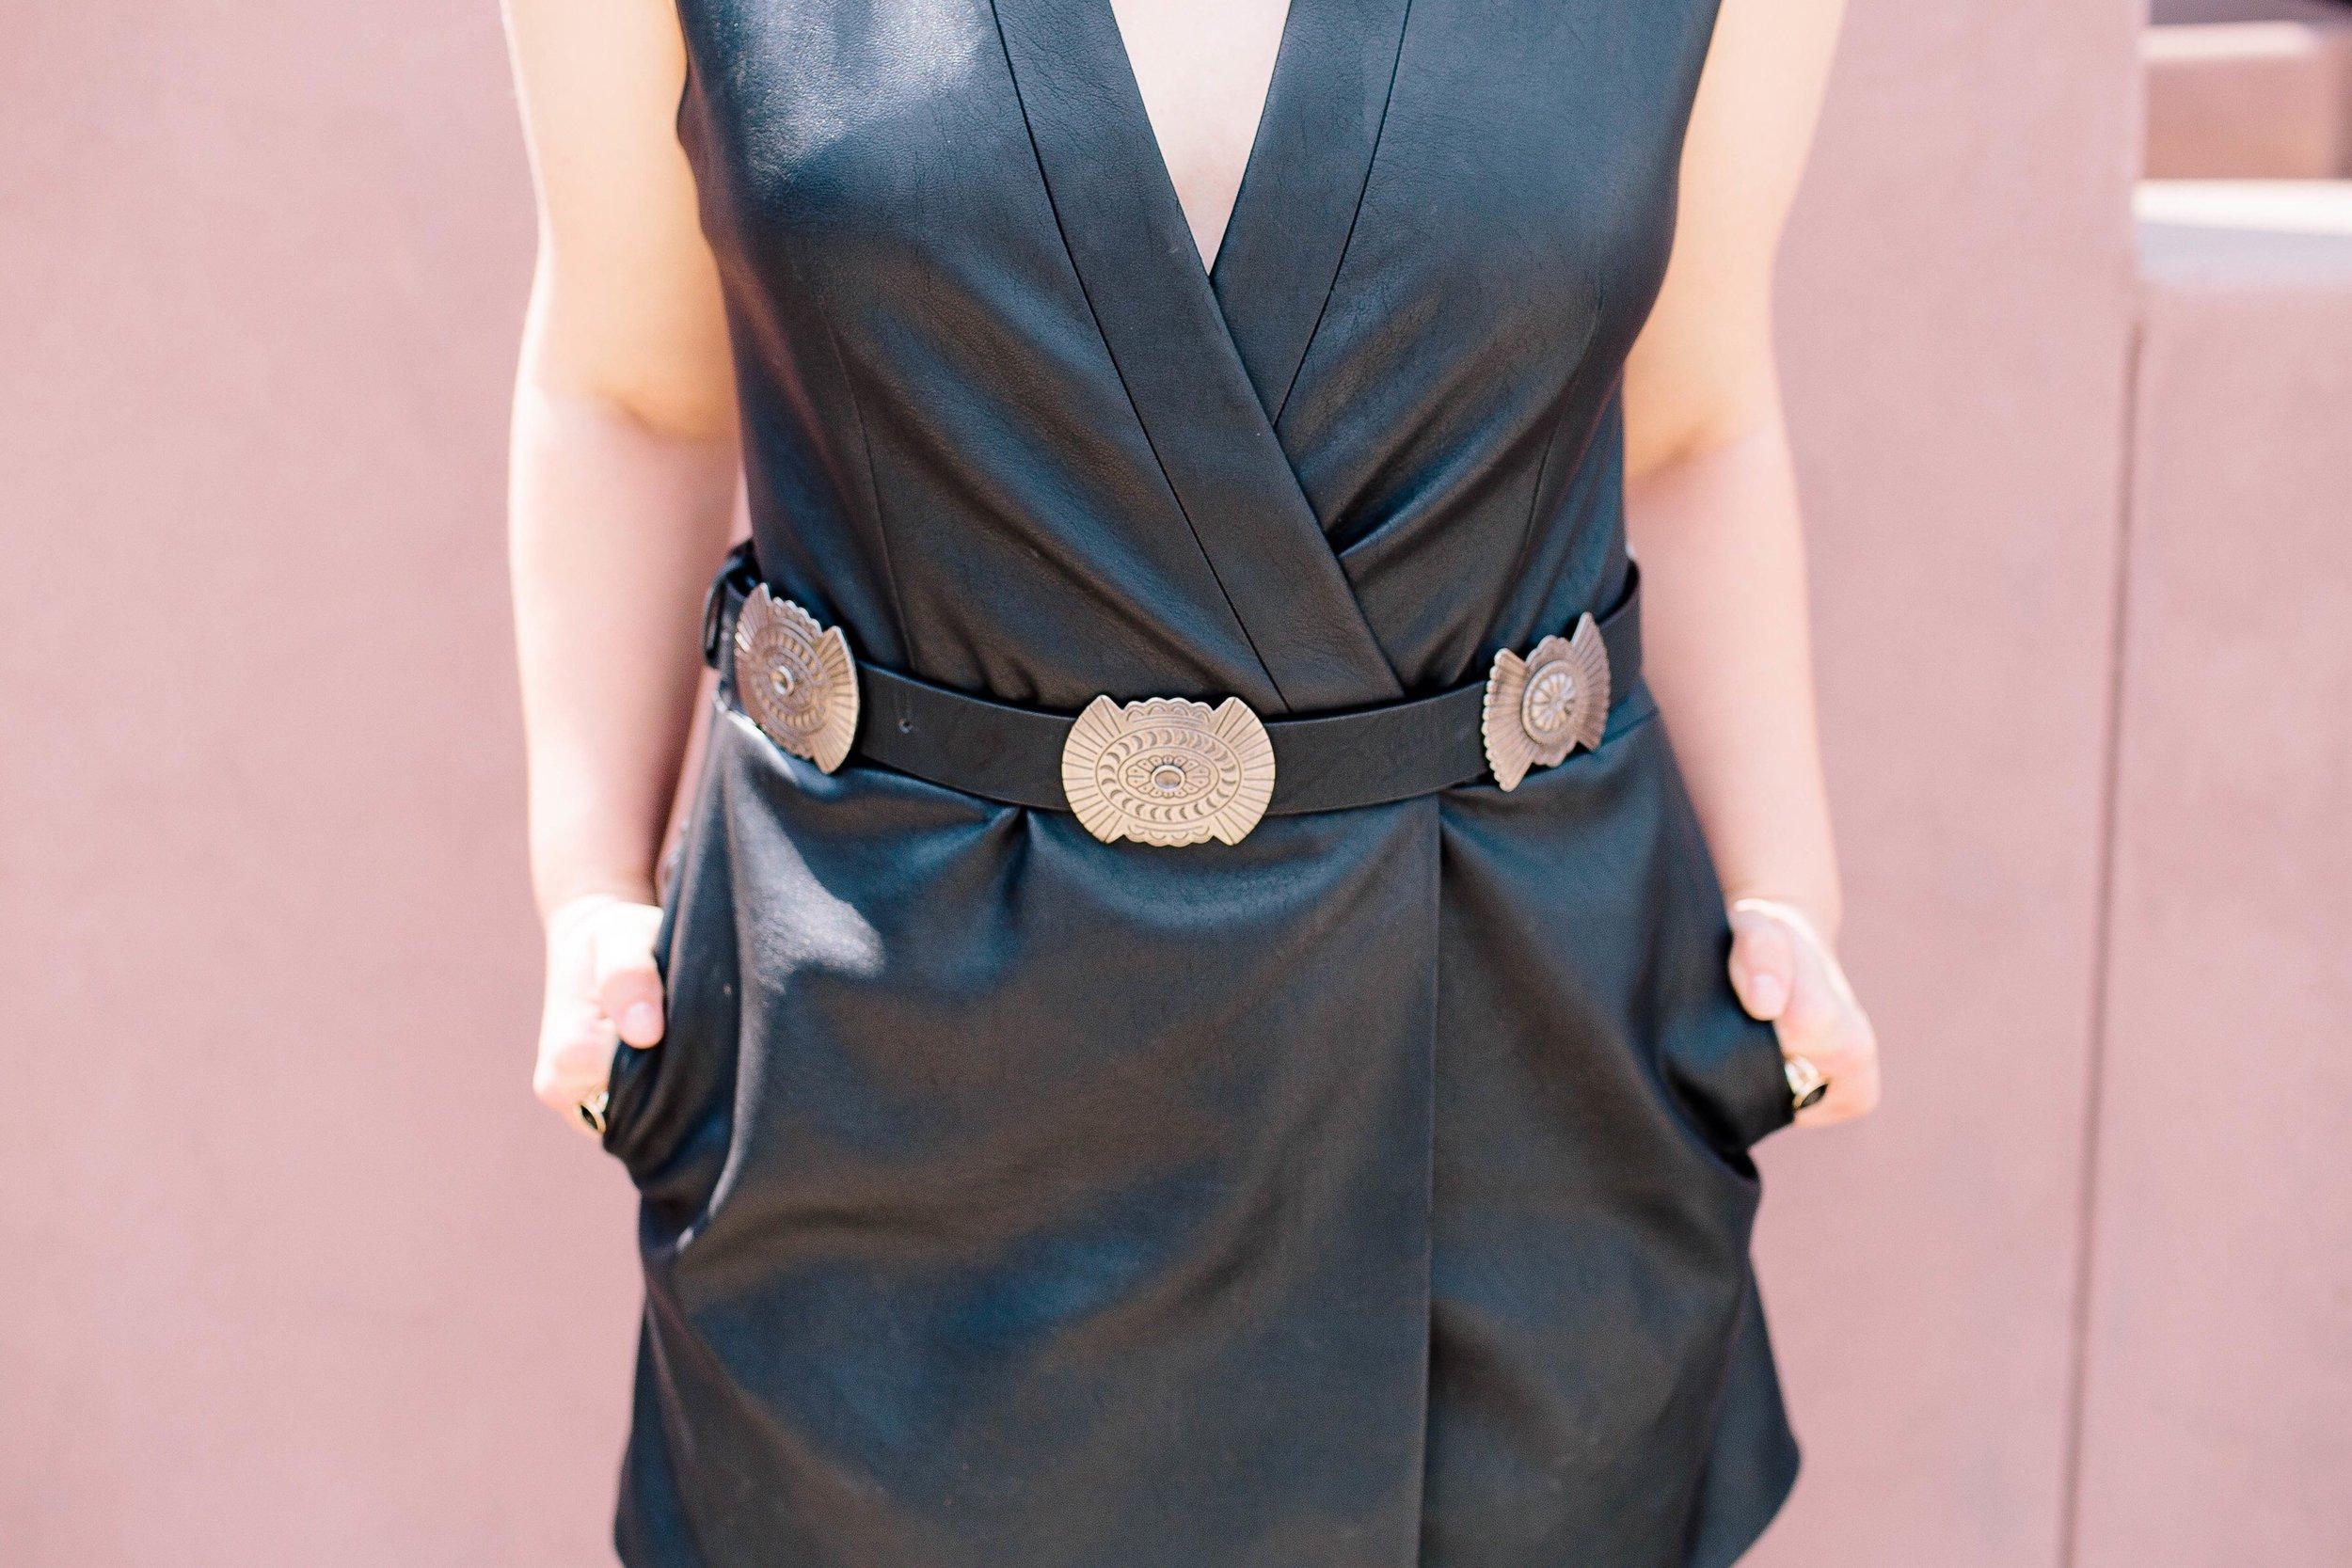 Booties  |  Belt  | Turquoise: Vintage